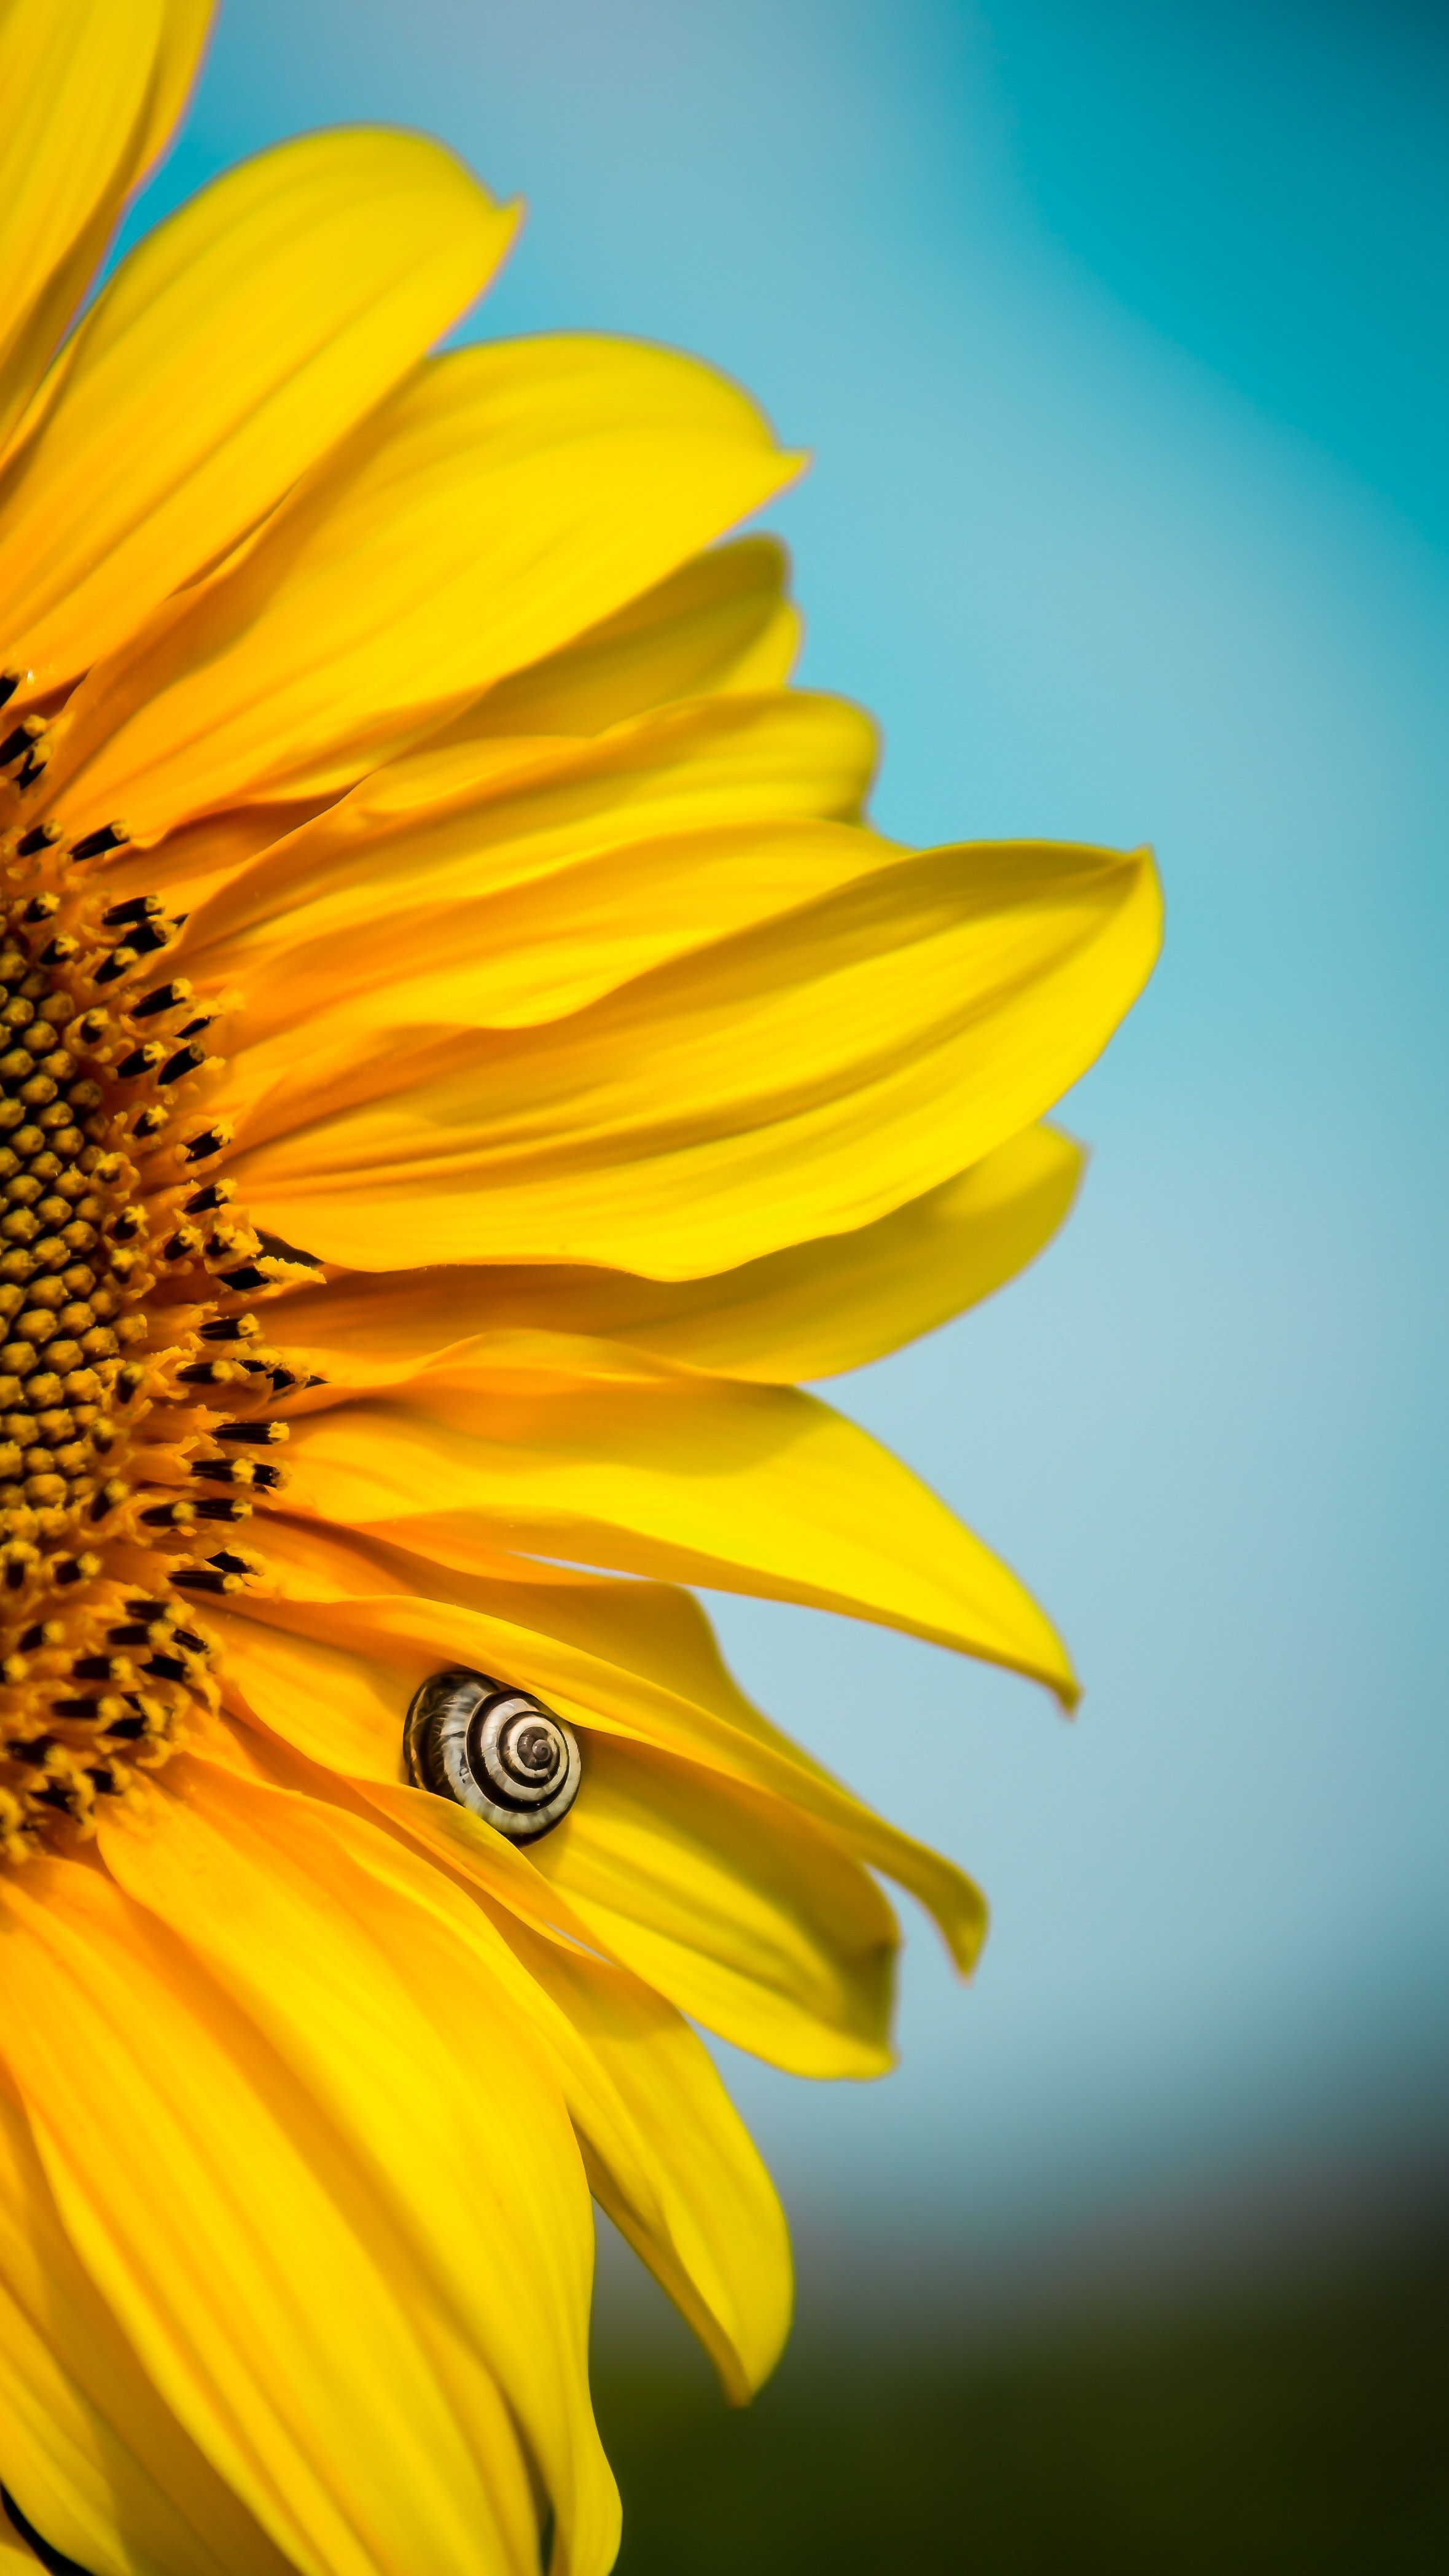 Beautiful Blooming Sunflower Wallpaper Sunflower Wallpaper Sunflower Photography Blooming Sunflower